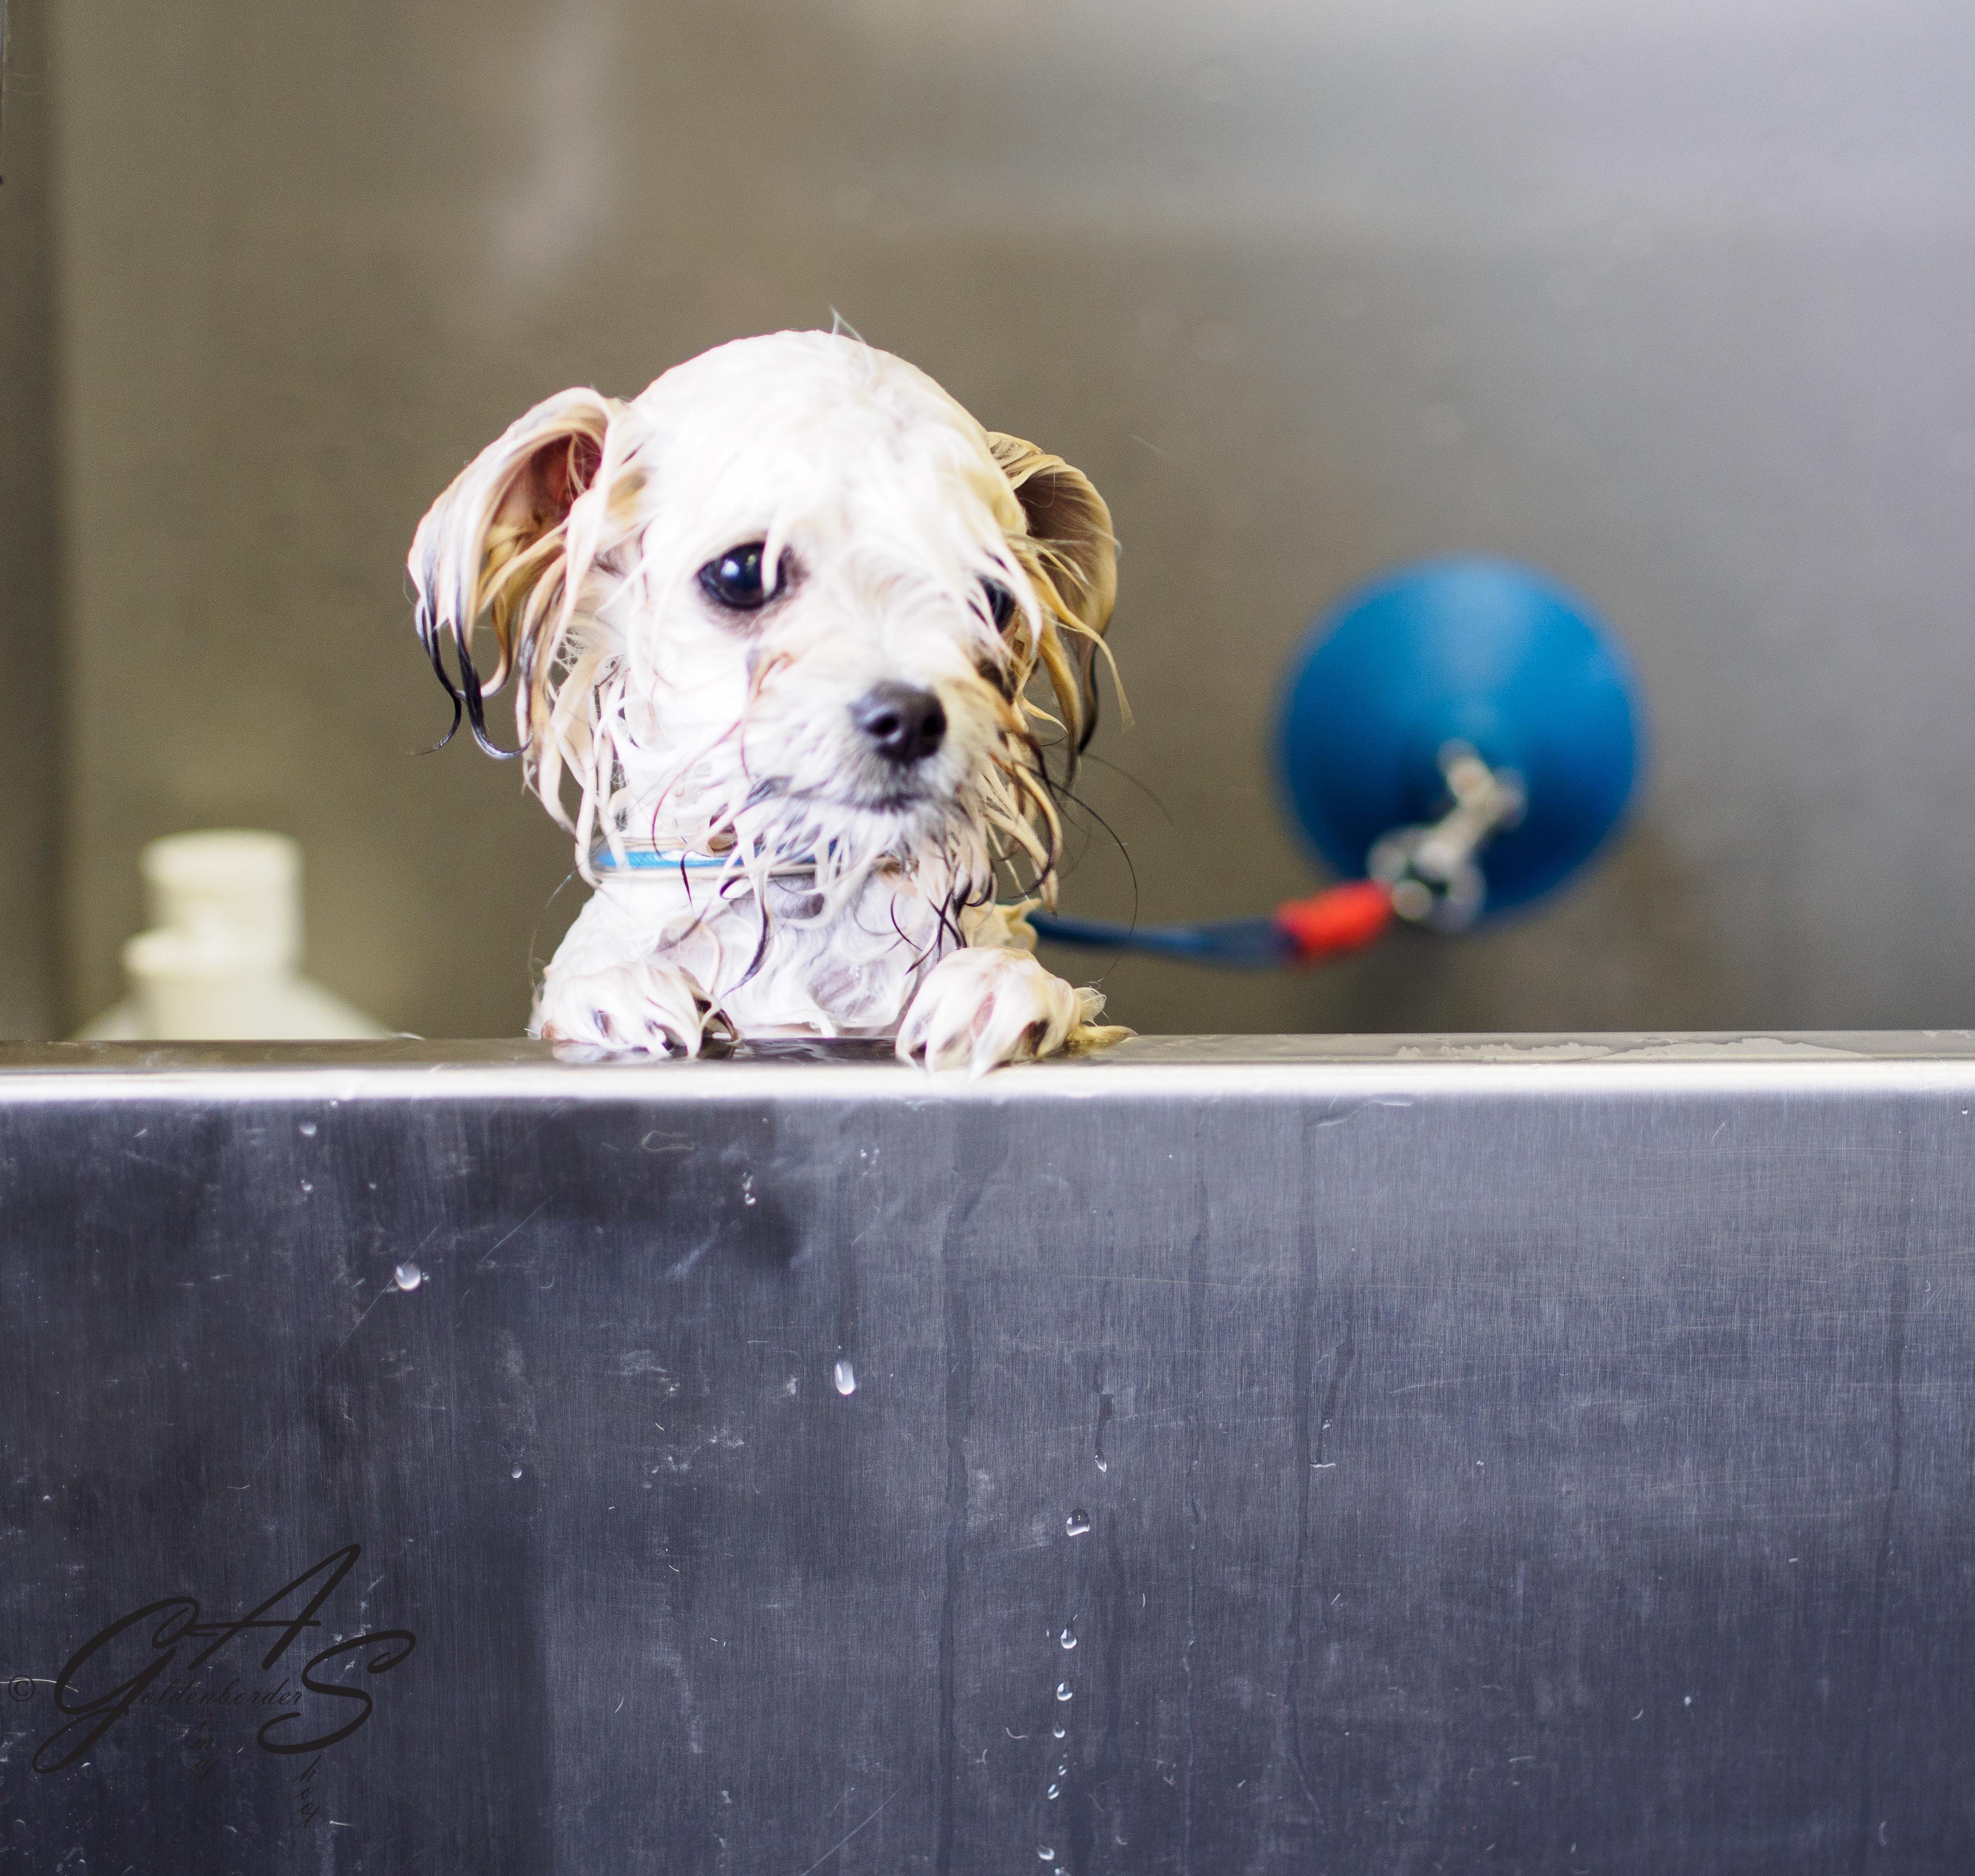 malchi  x maltezer  u2013 chihuahua   u2013 welkom bij goldenborders hondenverzorging